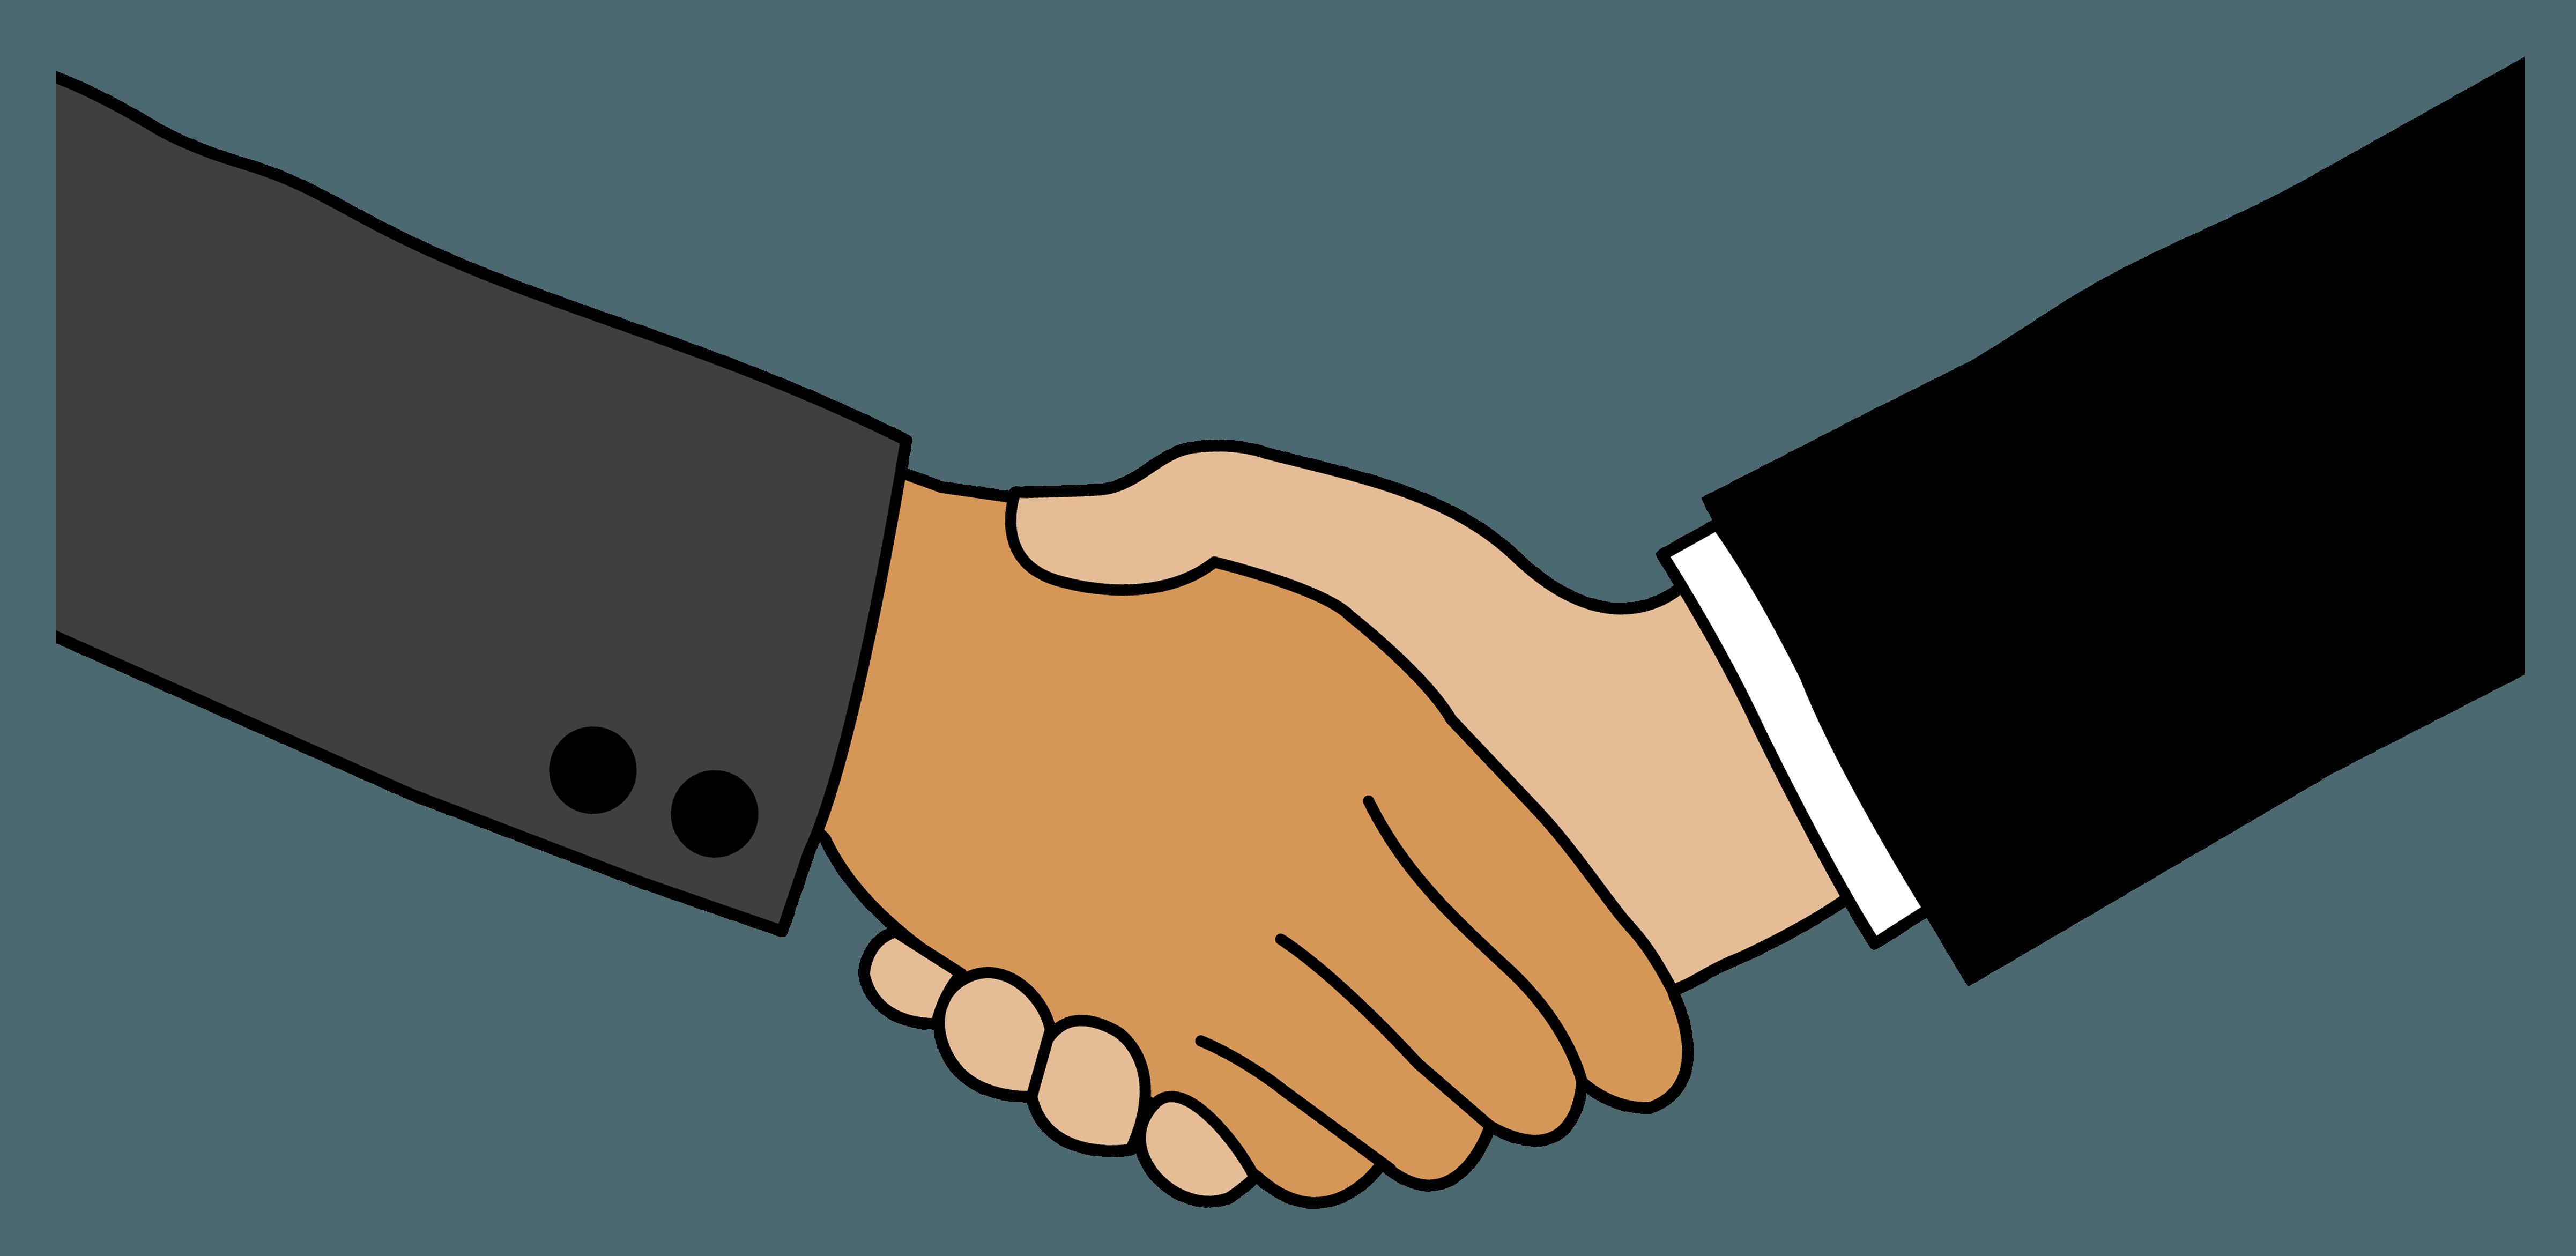 Appoint desktop backgrounds billion. Handshake clipart day